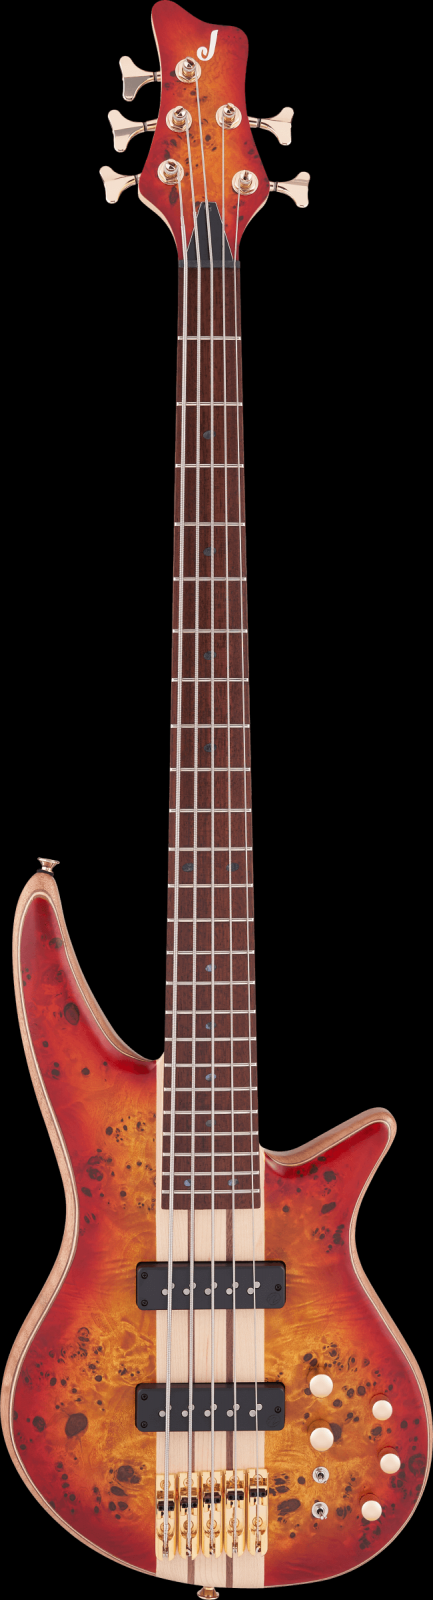 Pro Series Spectra Bass SBP V, Caramelized Jatoba Fingerboard, Transparent Cherry Burst